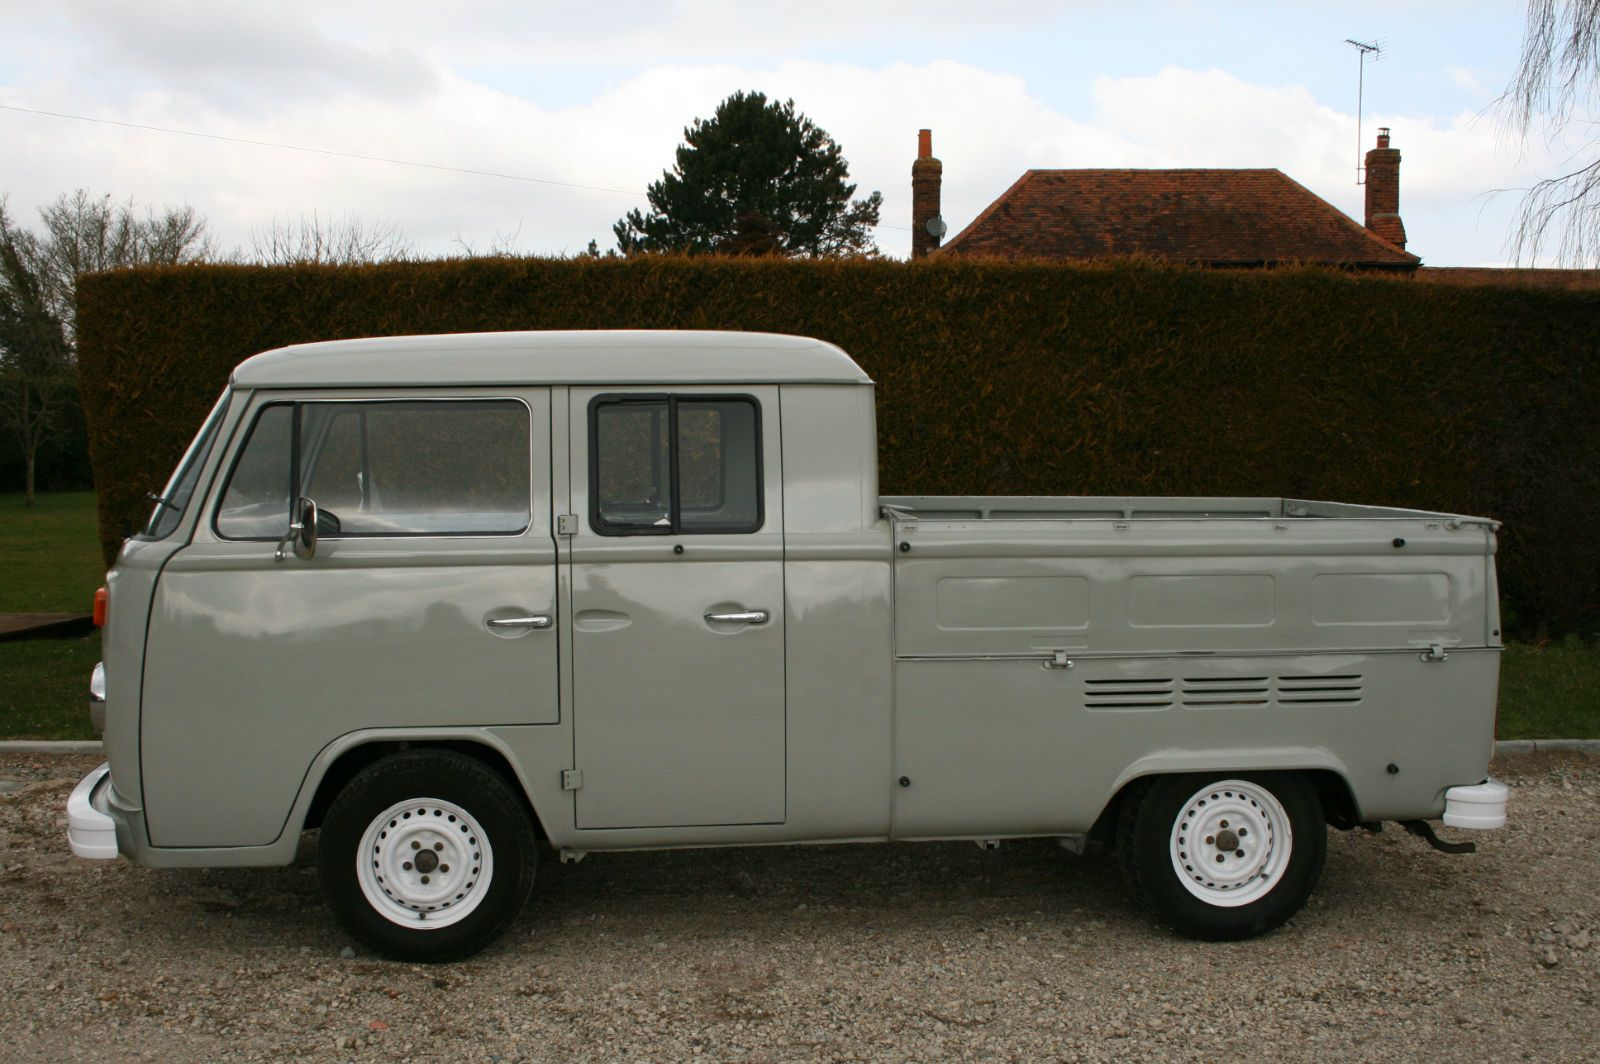 Volkswagen T2 Bay Window Double Cab Pick Up Ute,Fully Restored RHD ...